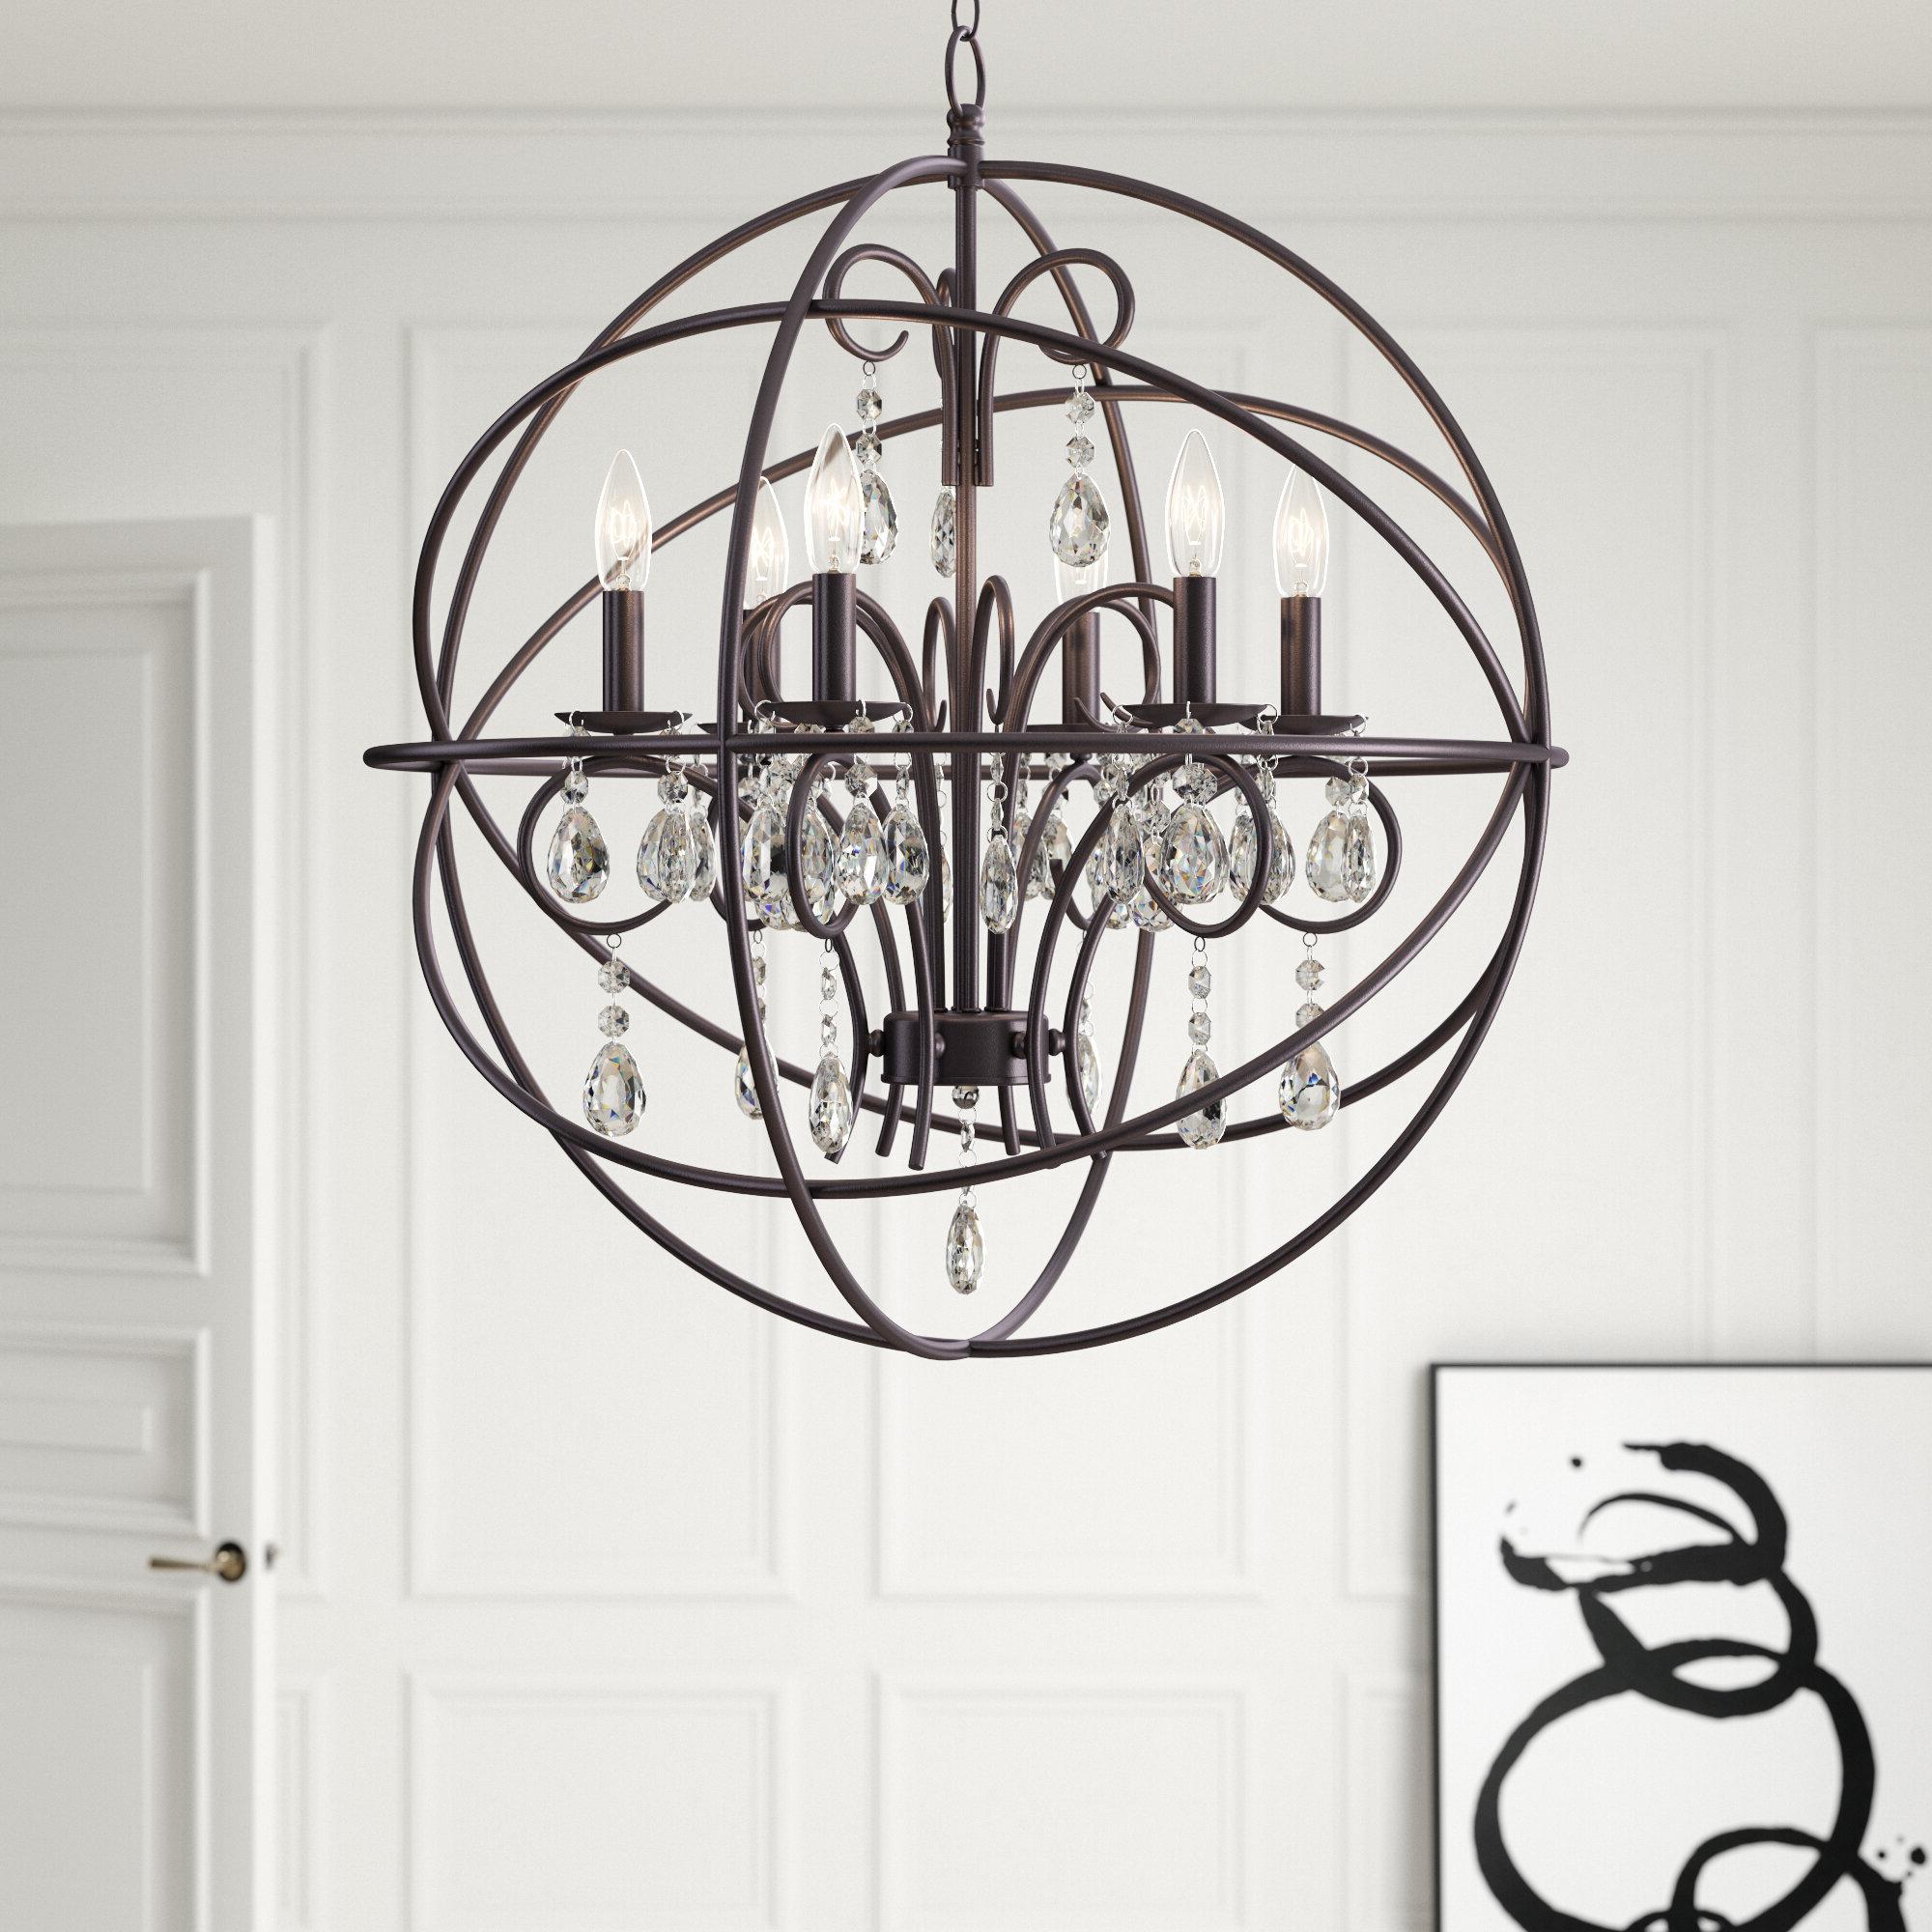 Best And Newest Alden 6 Light Globe Chandeliers With Alden 6 Light Globe Chandelier (View 8 of 25)